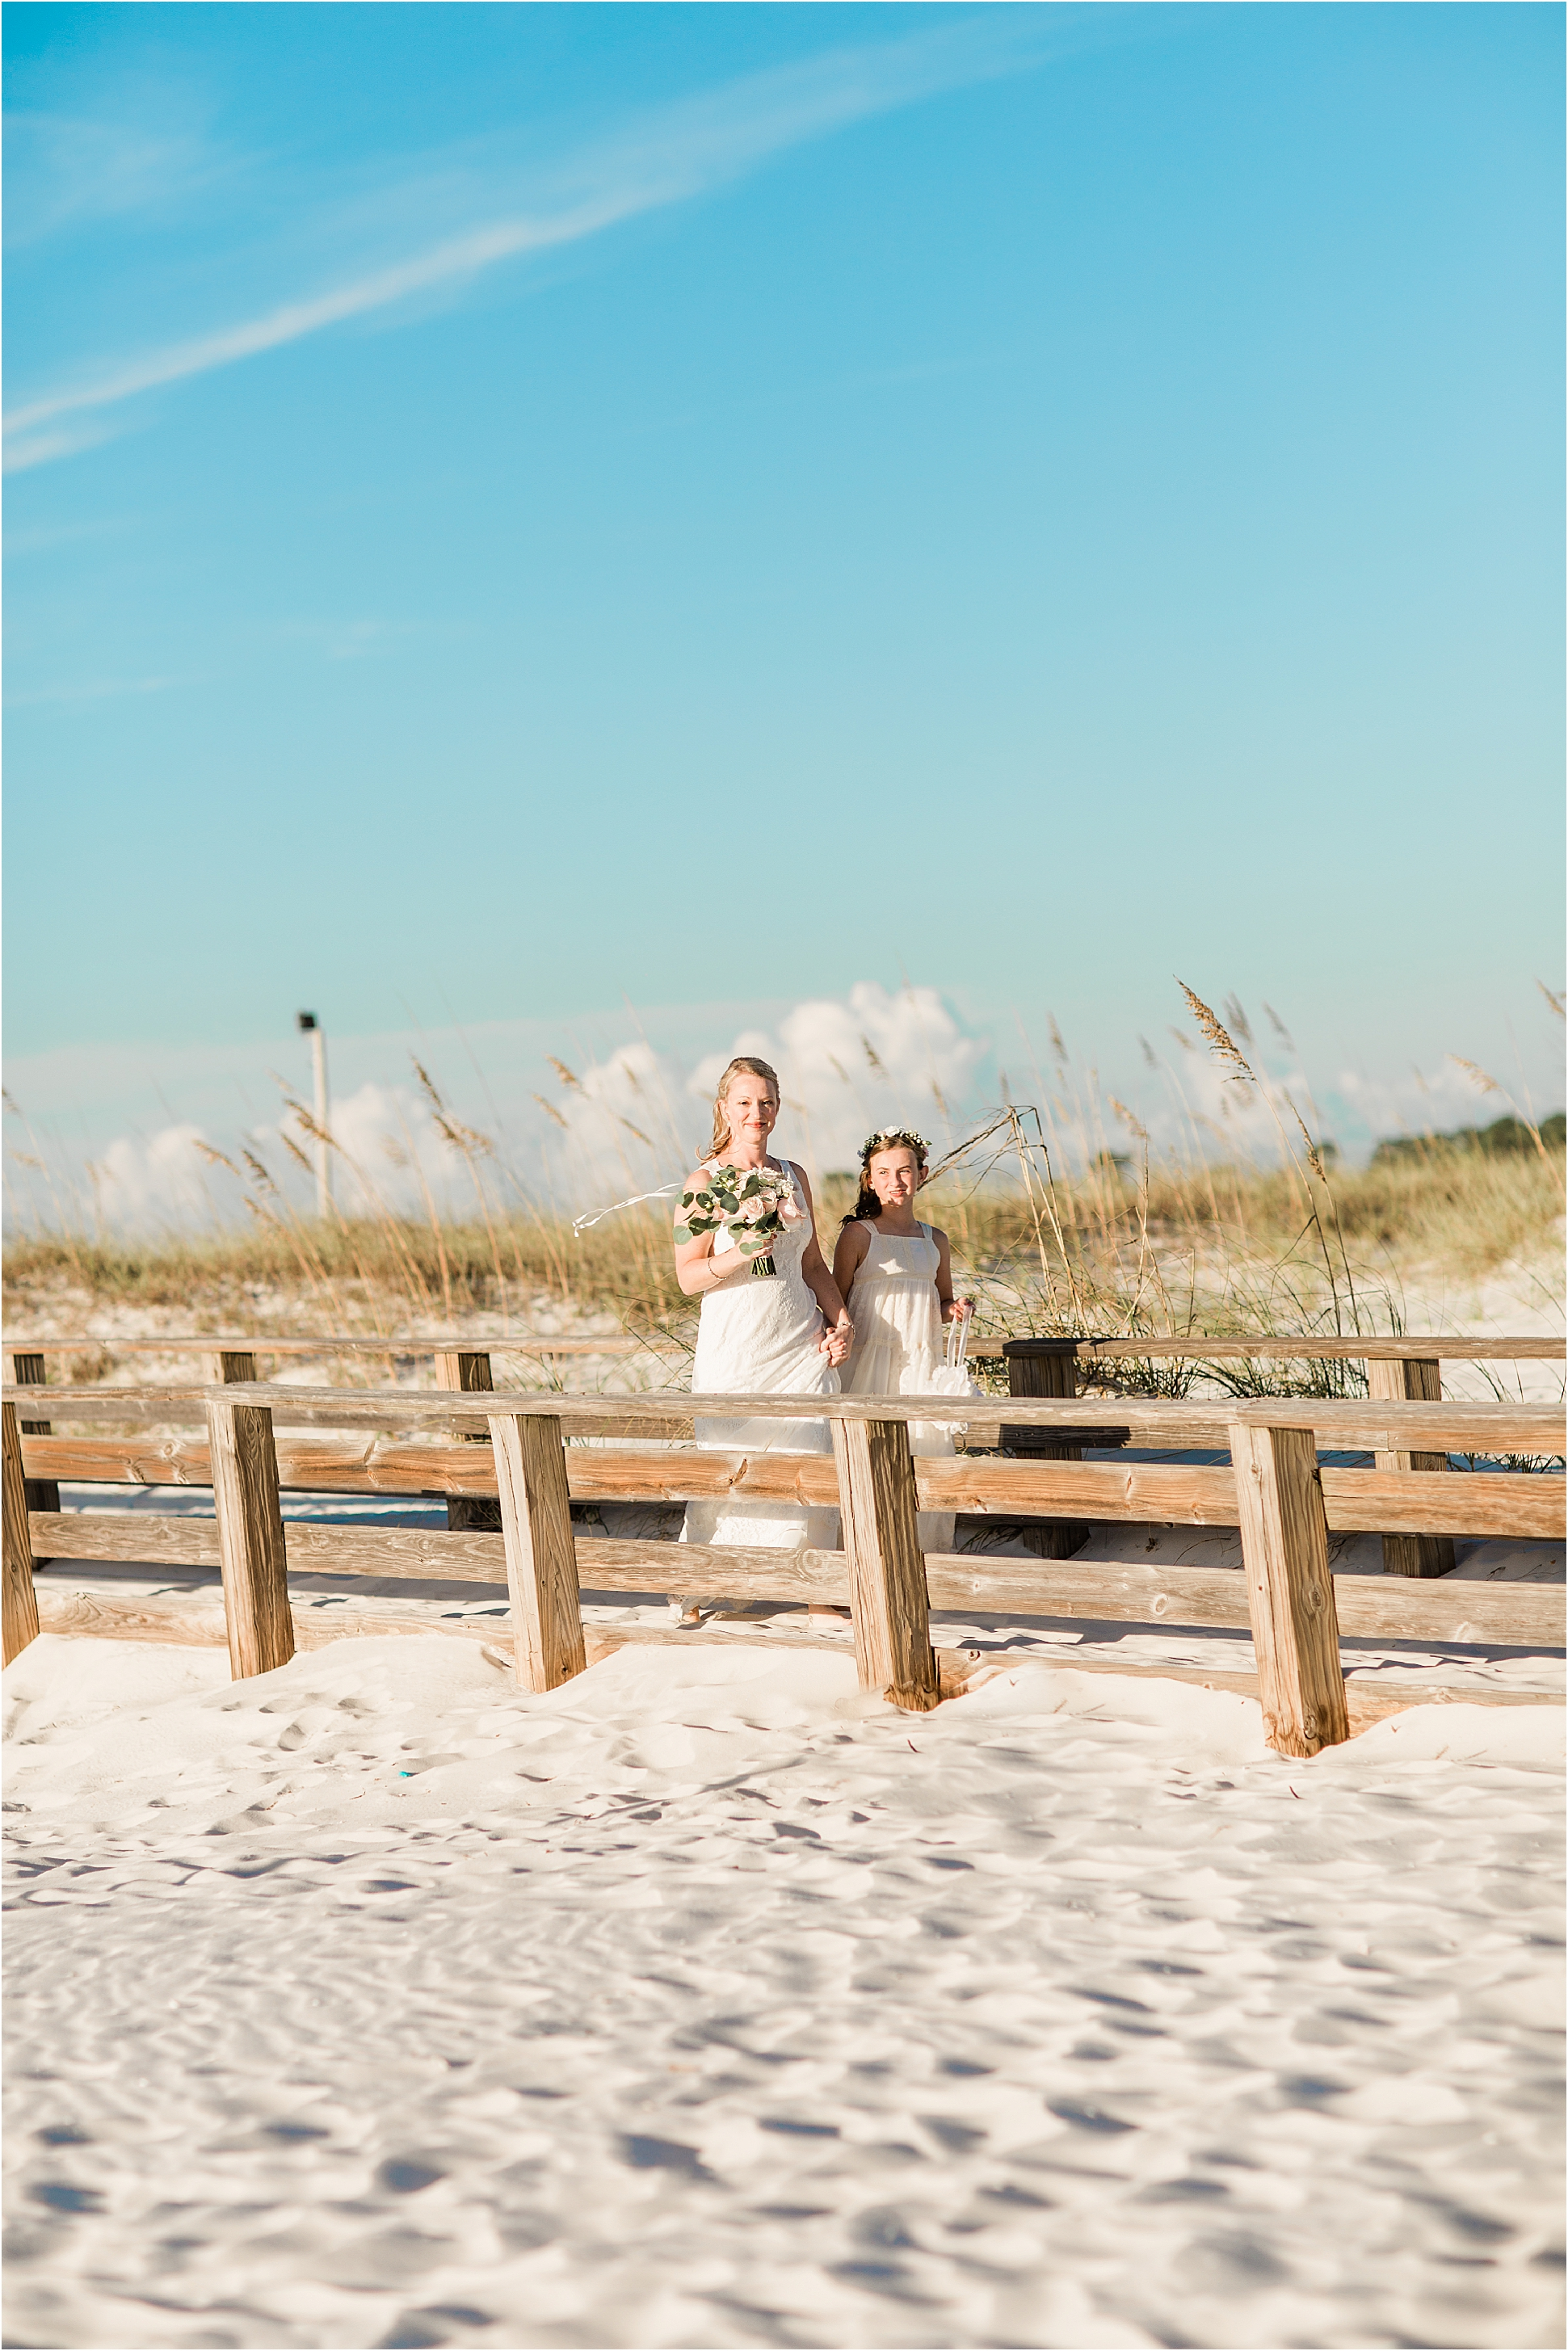 Wedding Ceremonies in Gulf Shores, Alabama